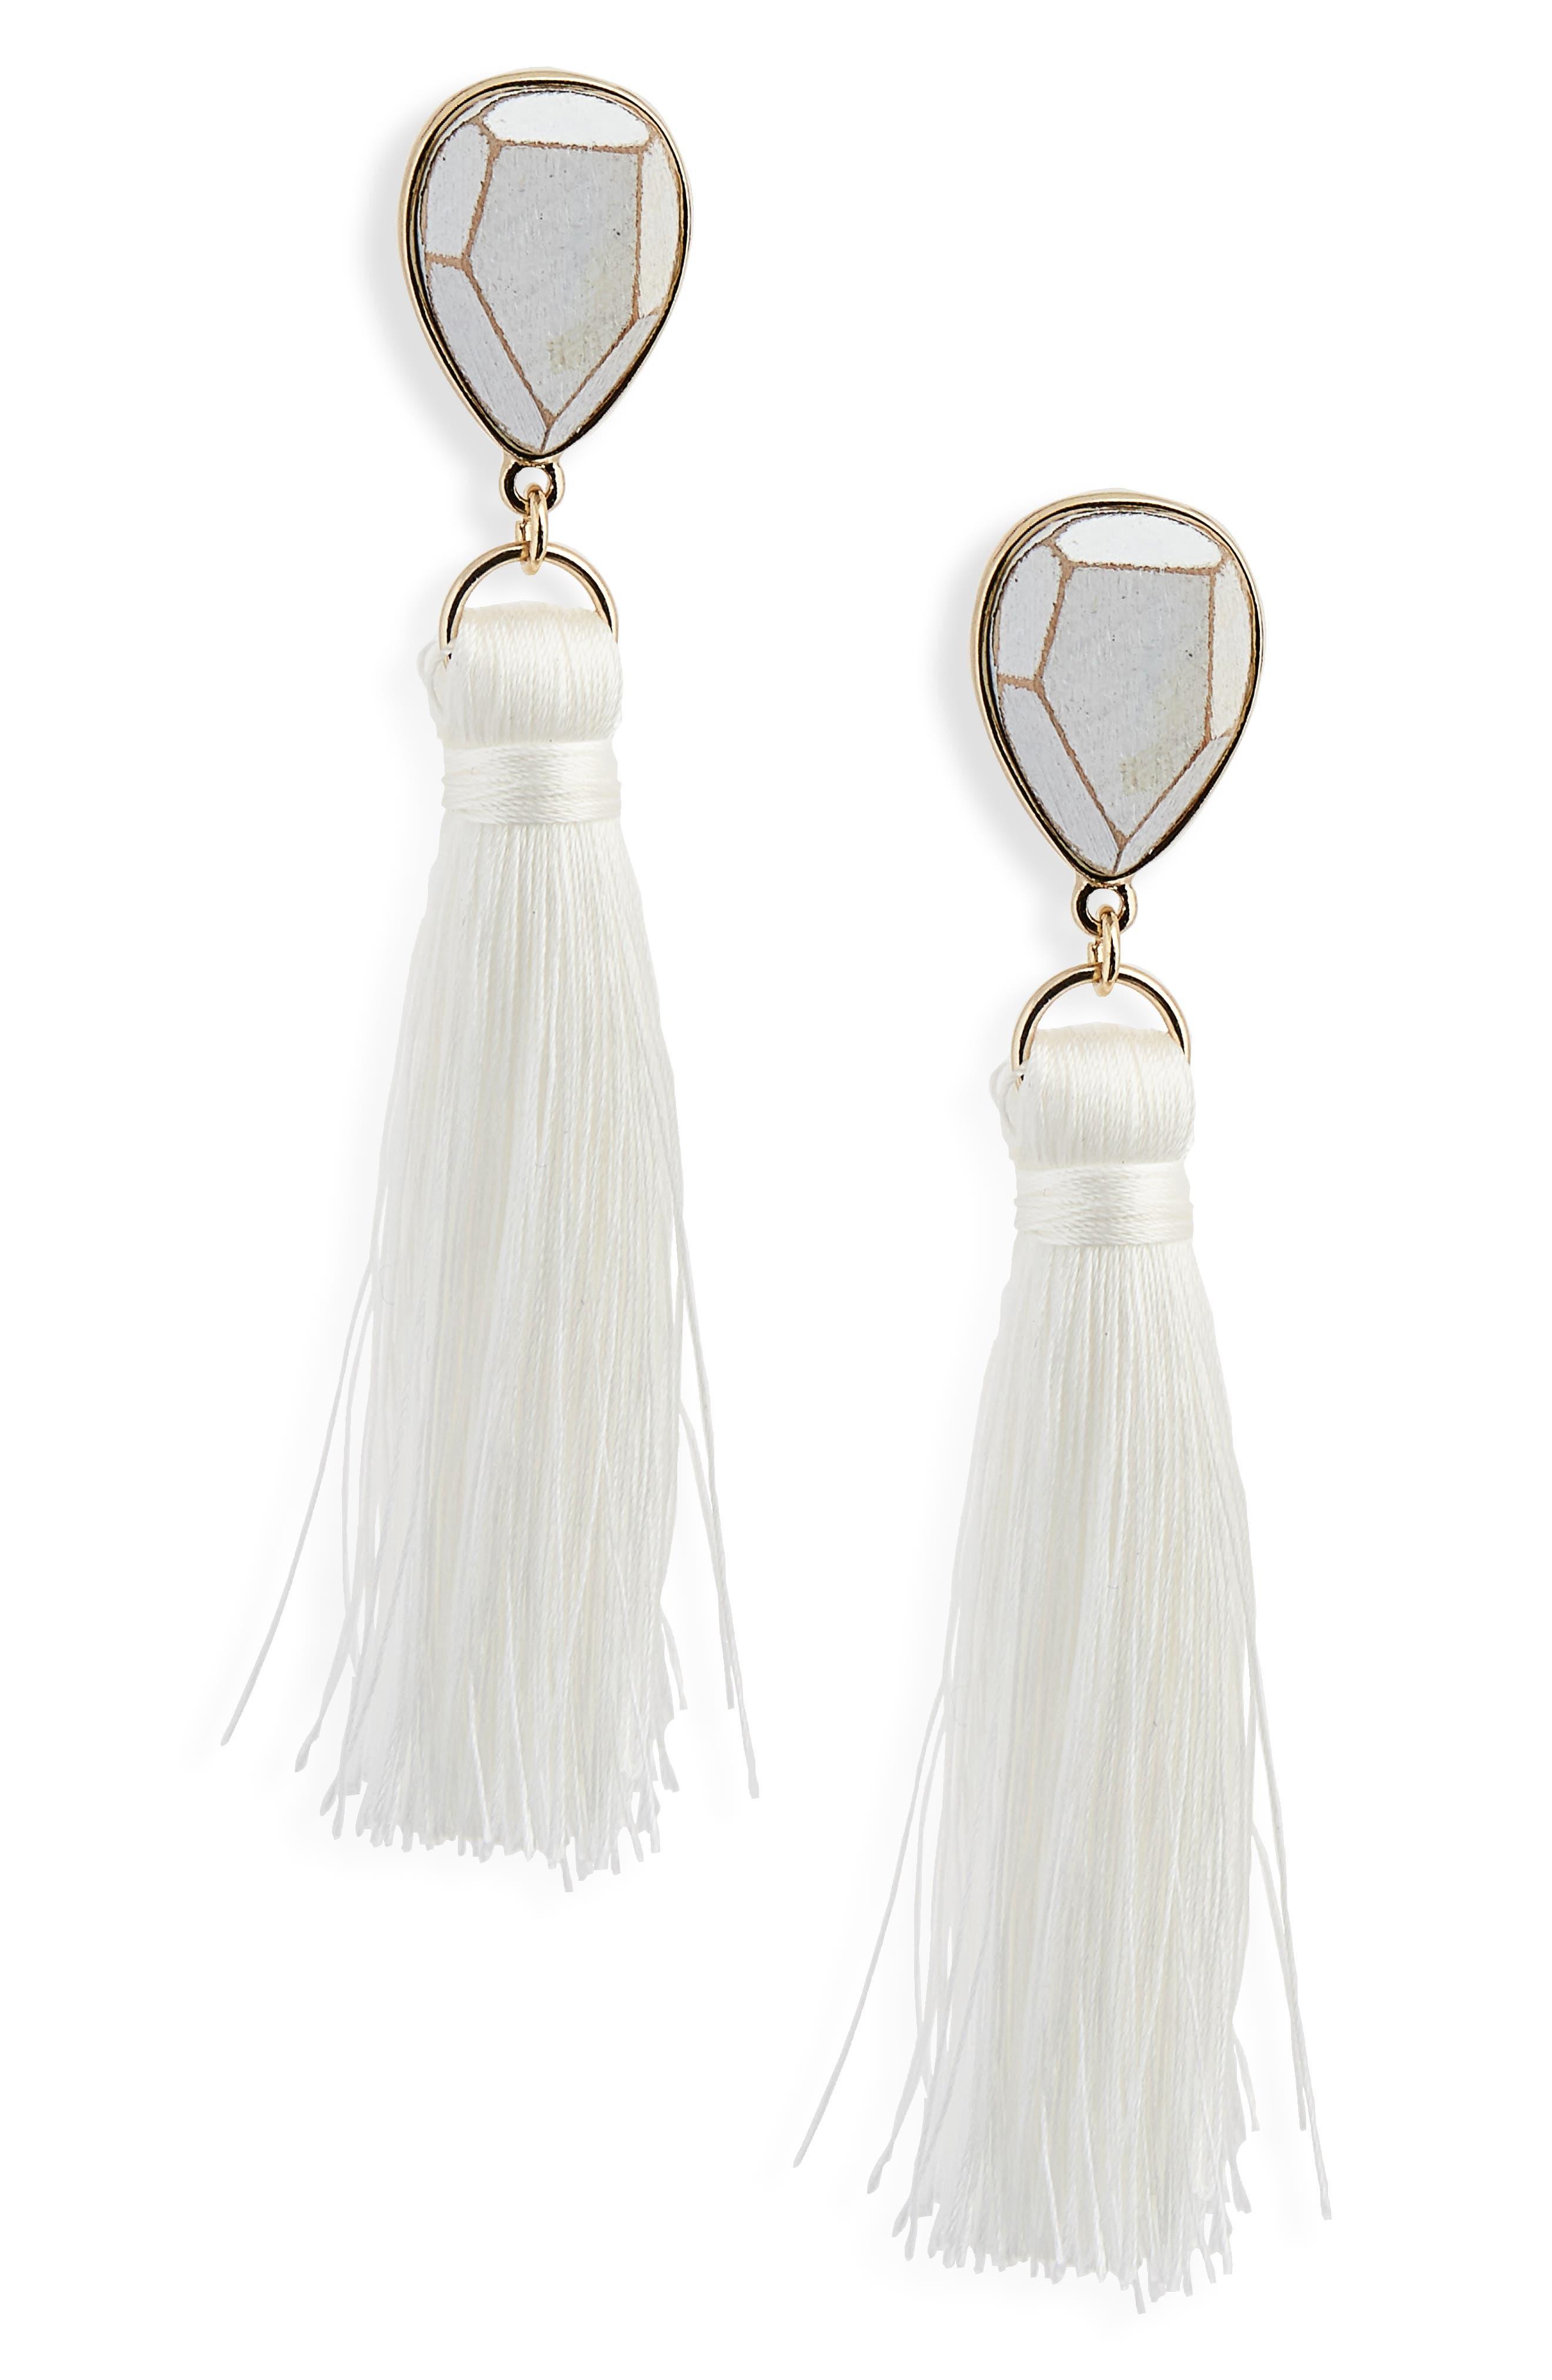 Wood Tassel Drop Earrings,                             Main thumbnail 1, color,                             White